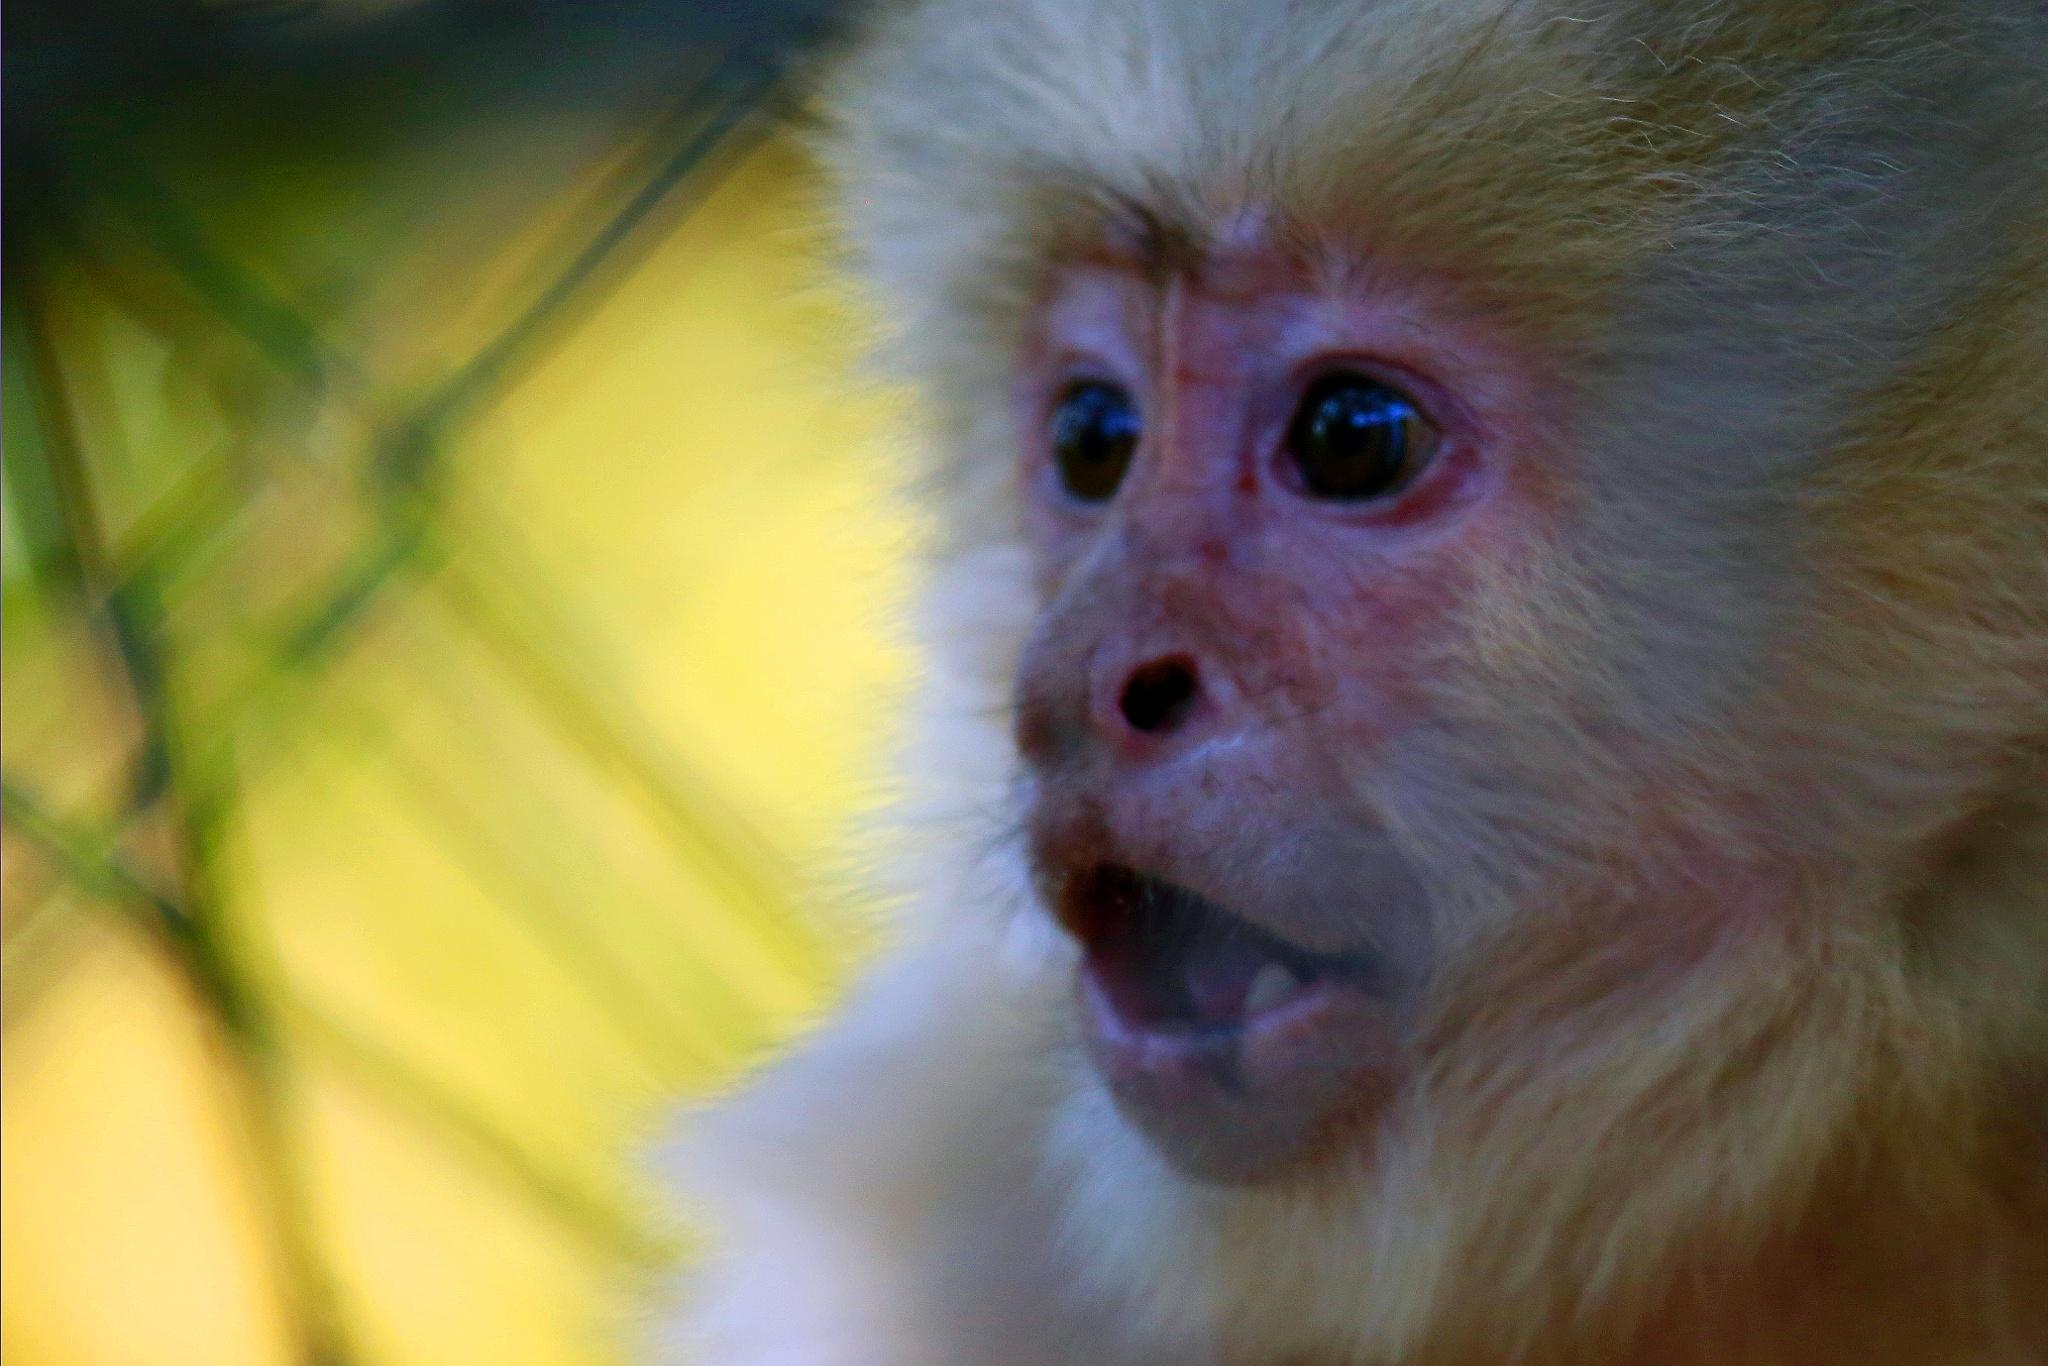 Surprised Monkey by Jason R. Rich